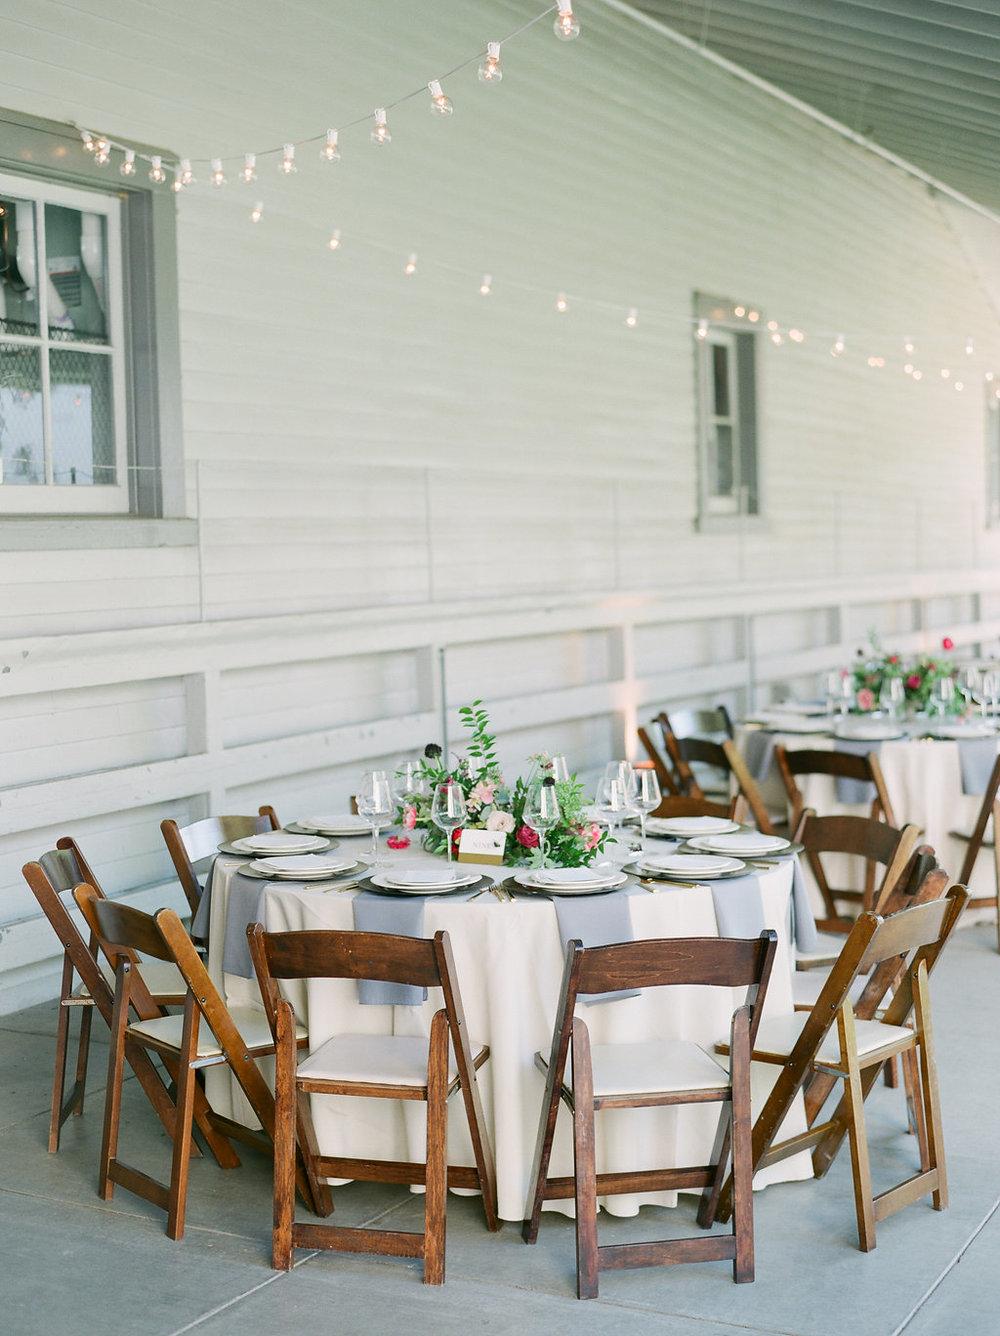 Belle Meade Plantation Carriage House Reception